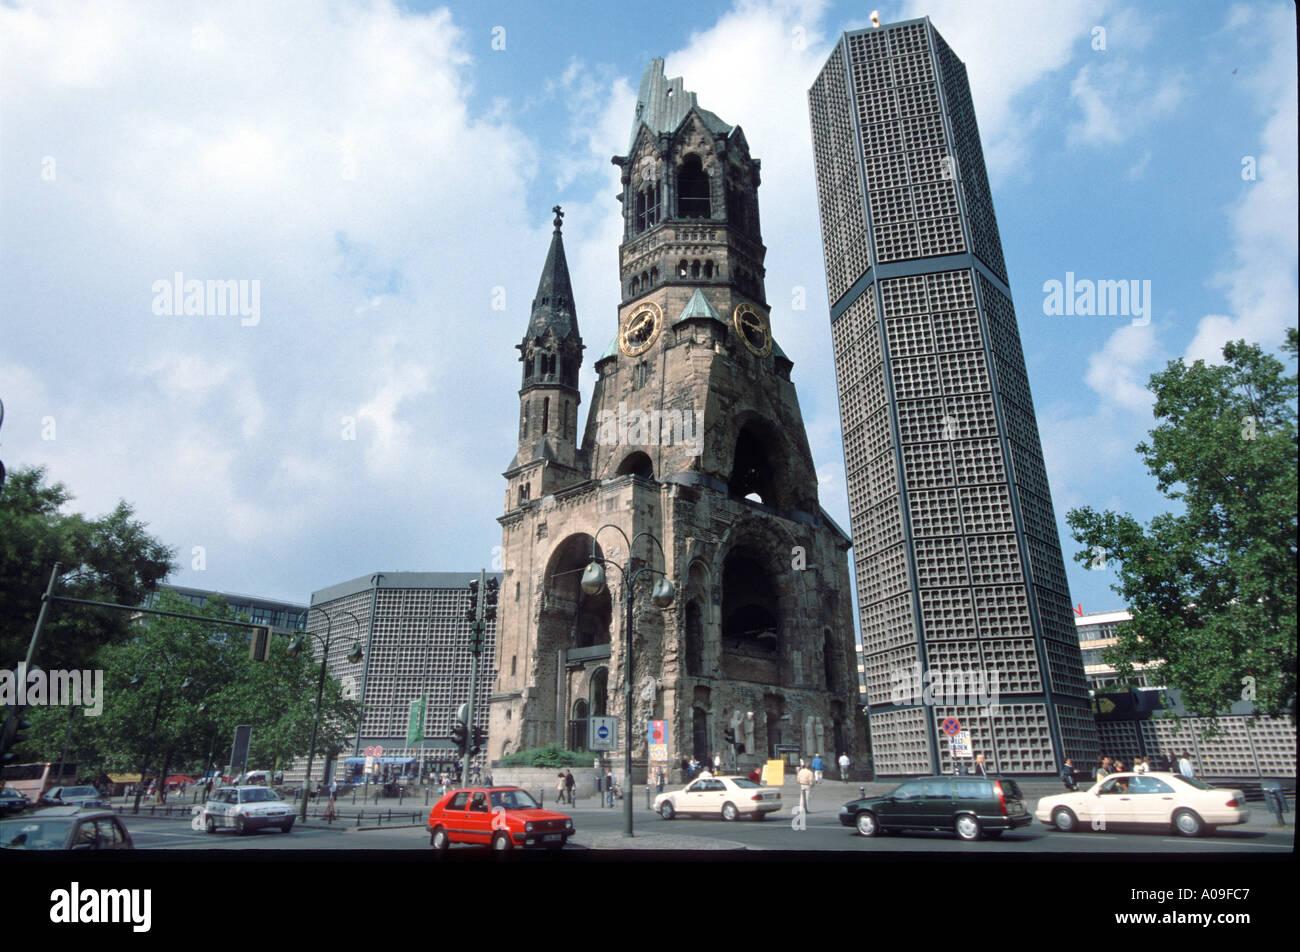 berlin kaiser wilhelm ged chtniskirche church kurf rstendamm stock photo 40903 alamy. Black Bedroom Furniture Sets. Home Design Ideas